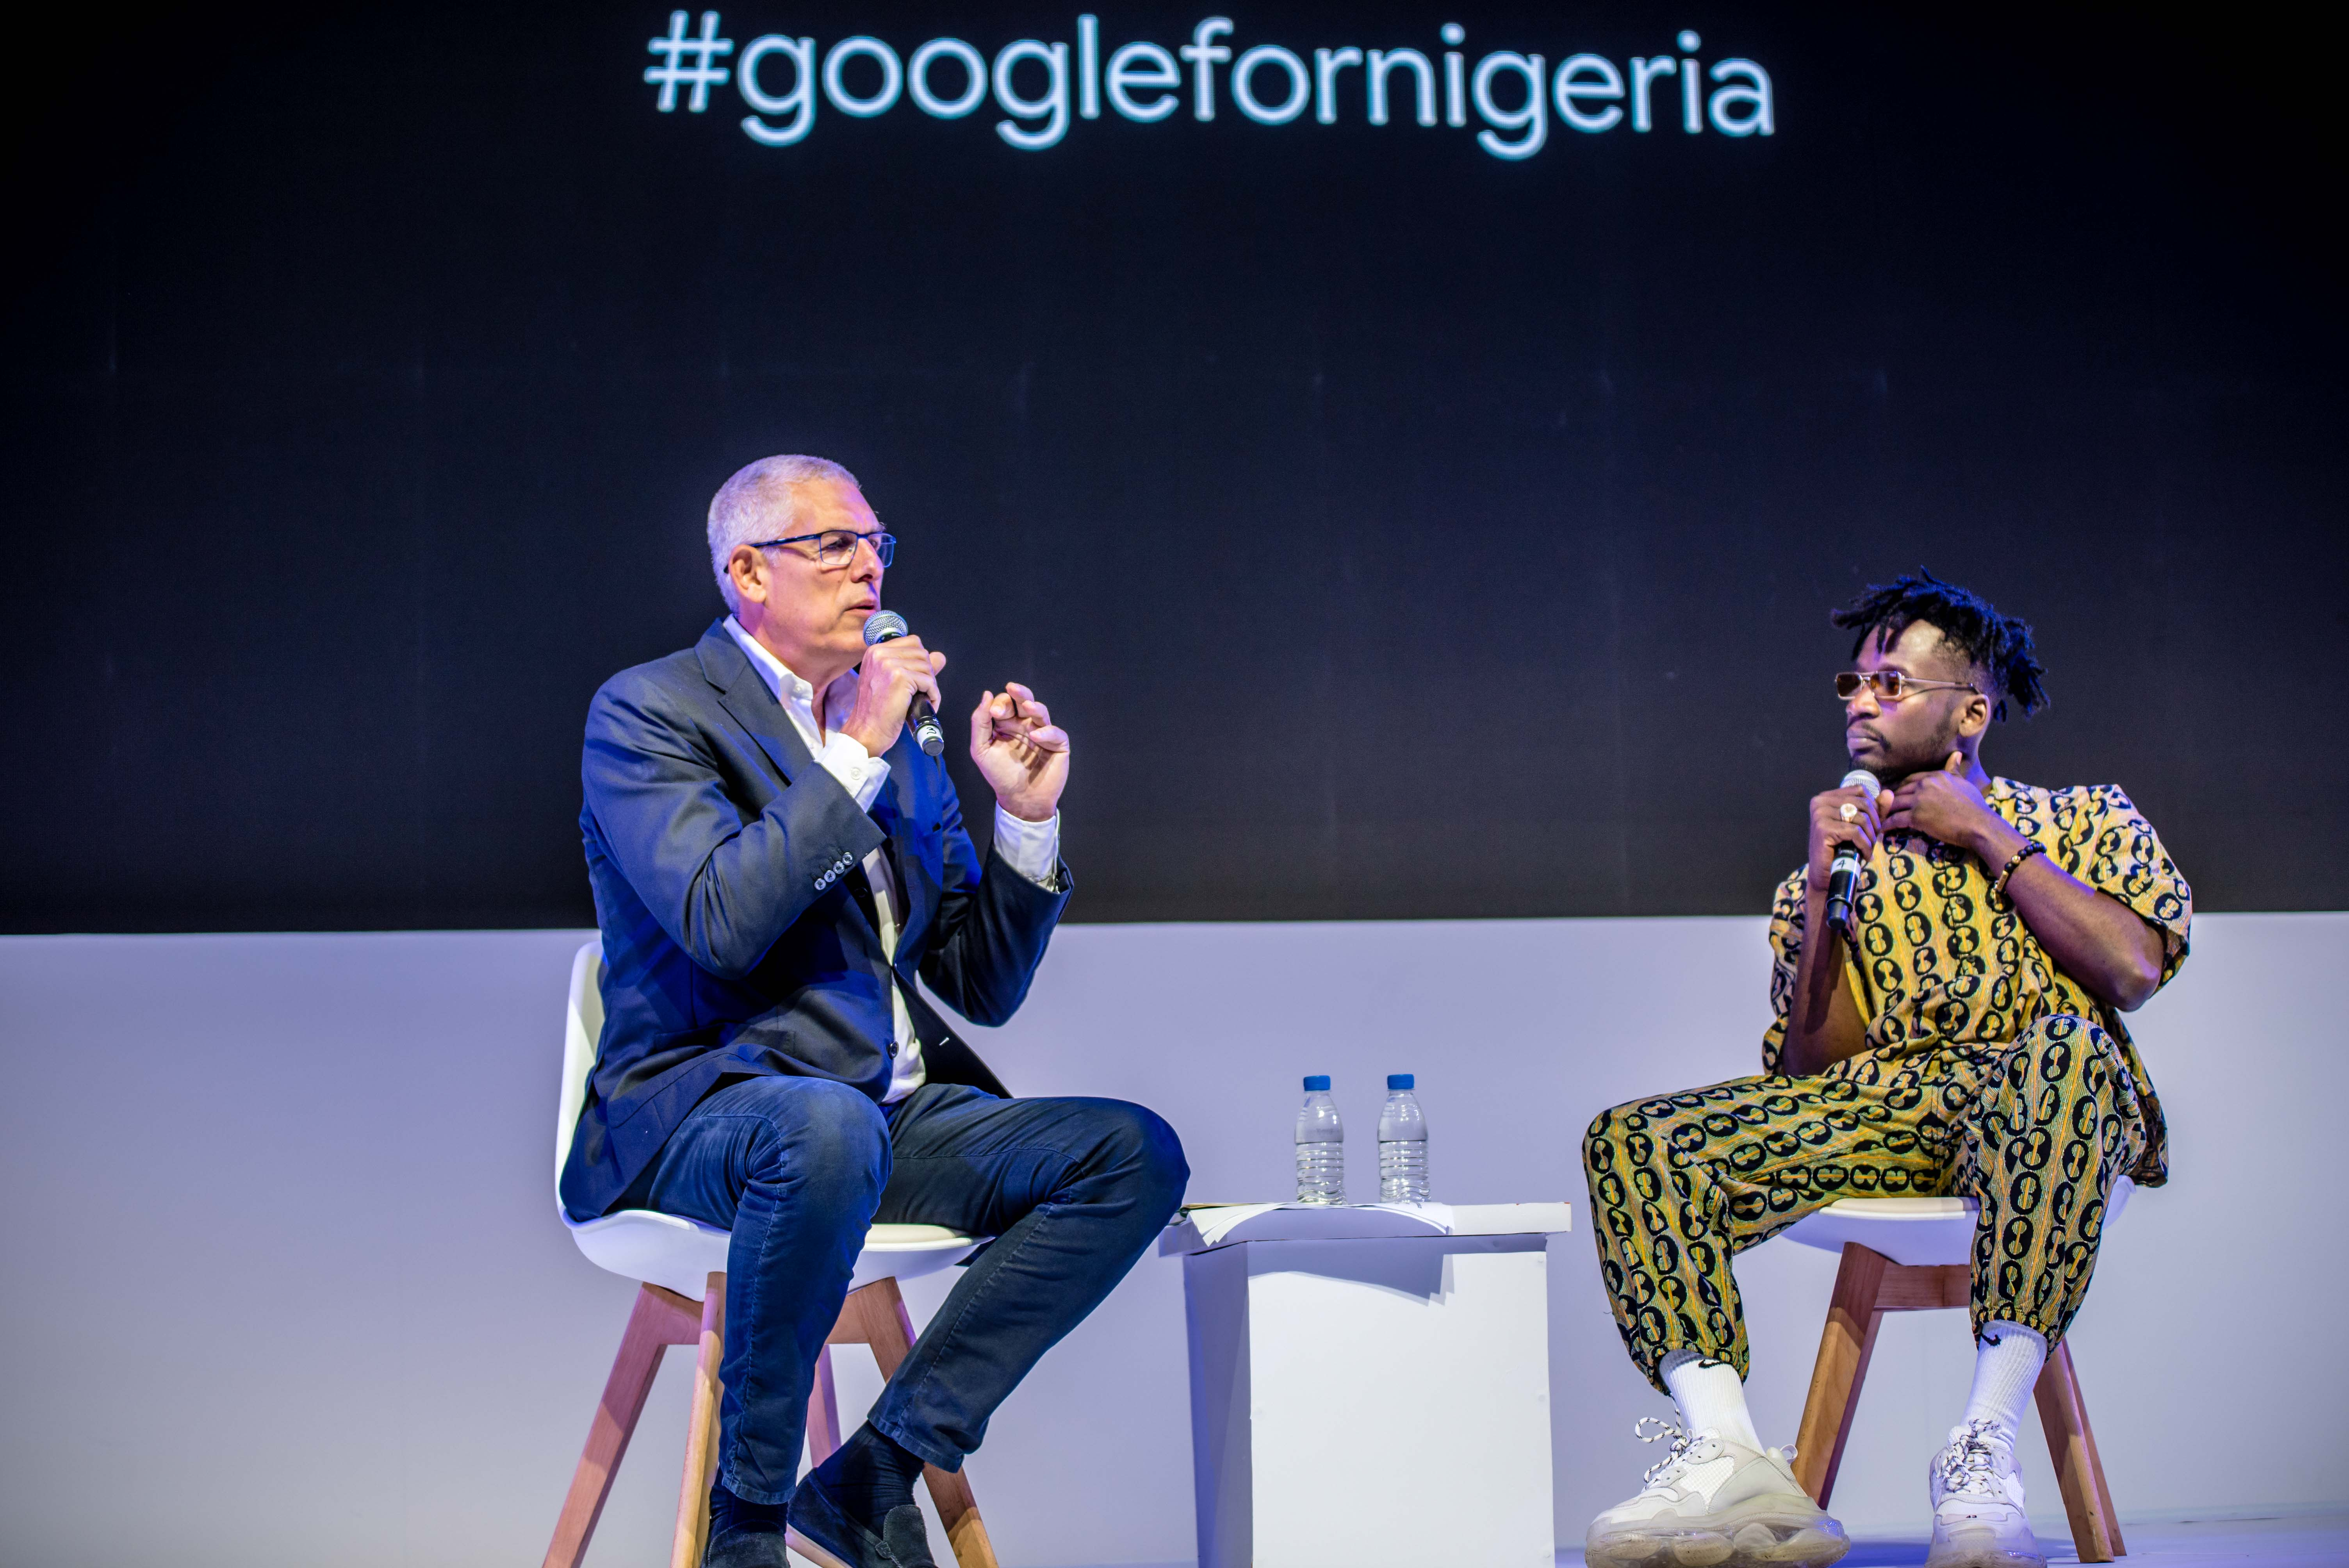 Lyor Cohen, global head of music at Google and YouTube, and Mr. Eazi.